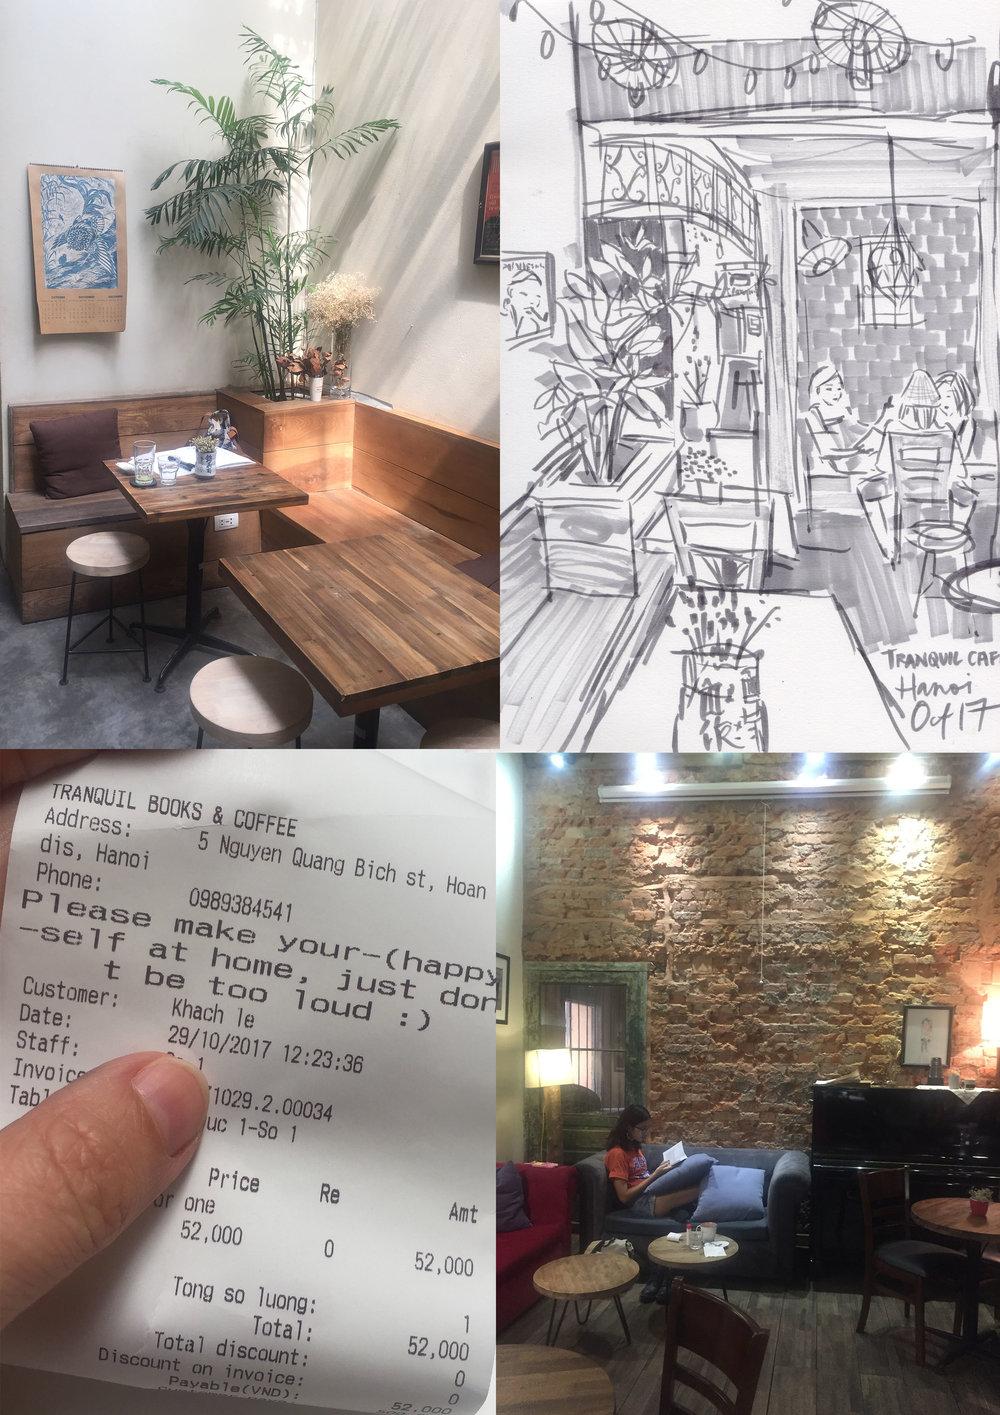 tranquil-cafe-hanoi